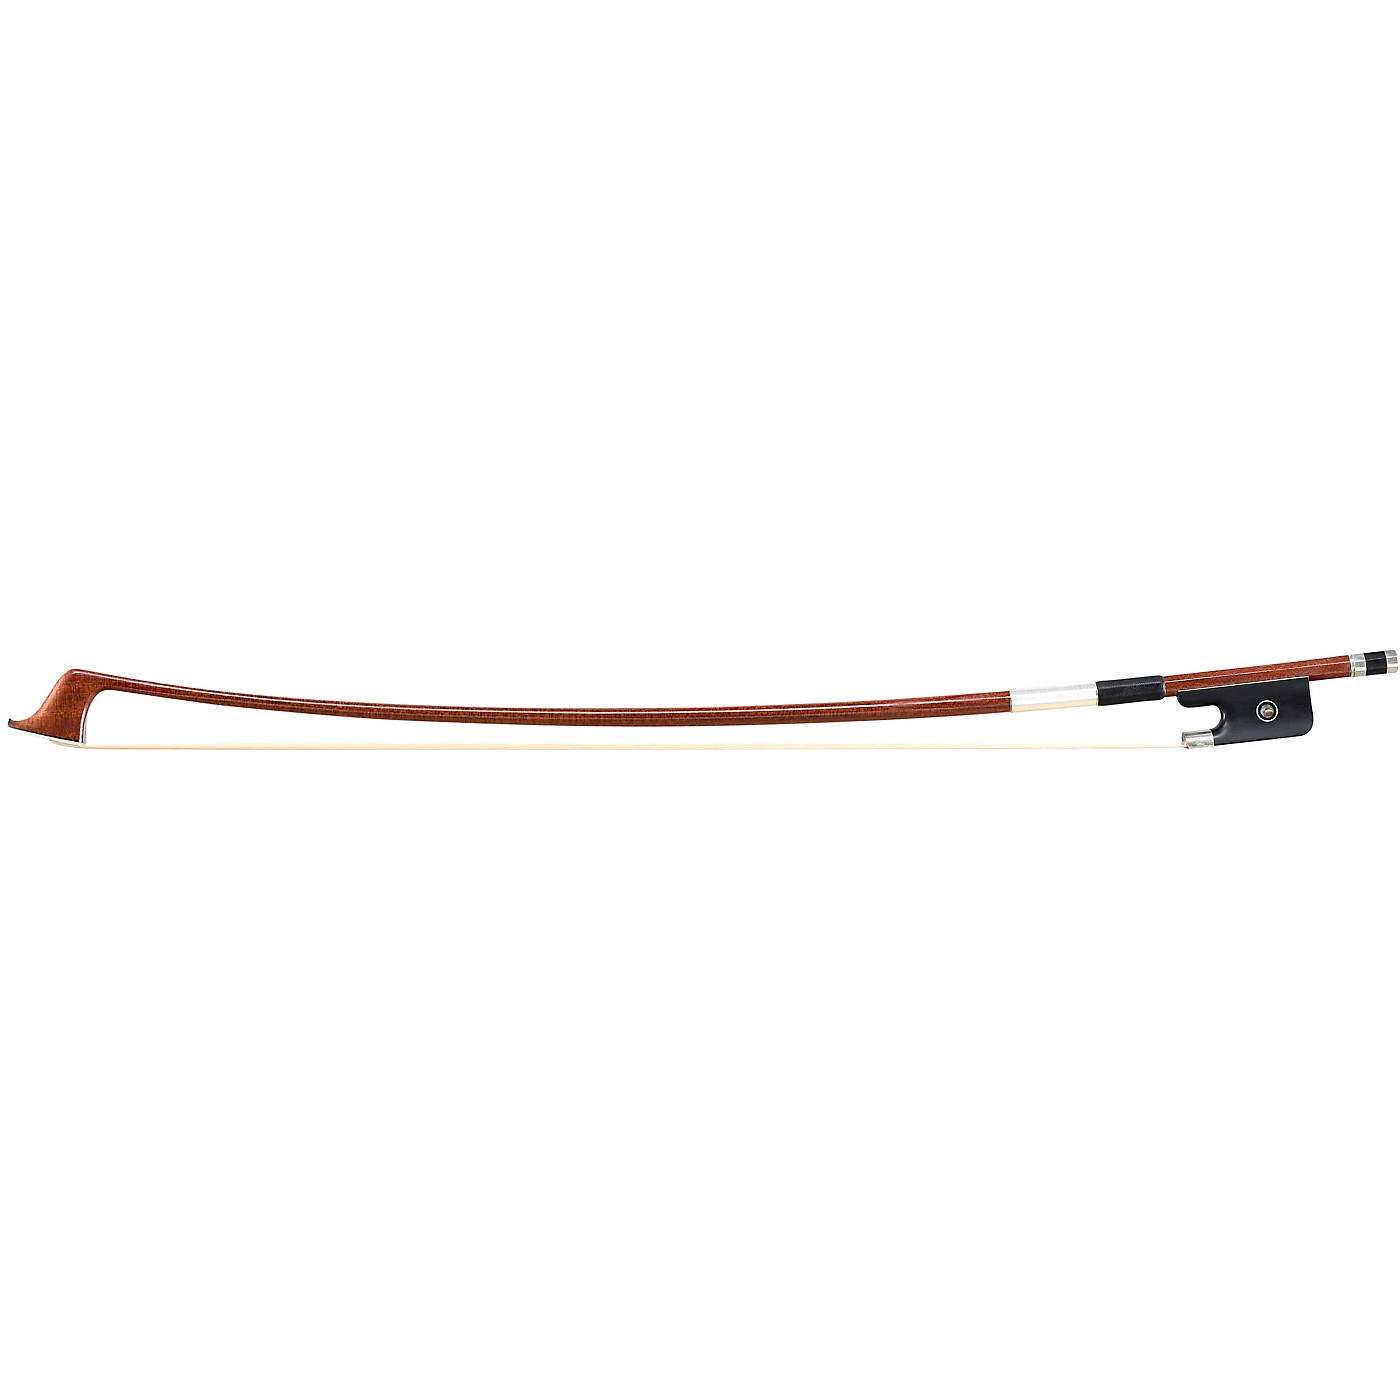 Artino Three Star Wood Veneer Carbon Fiber French Bass Bow thumbnail